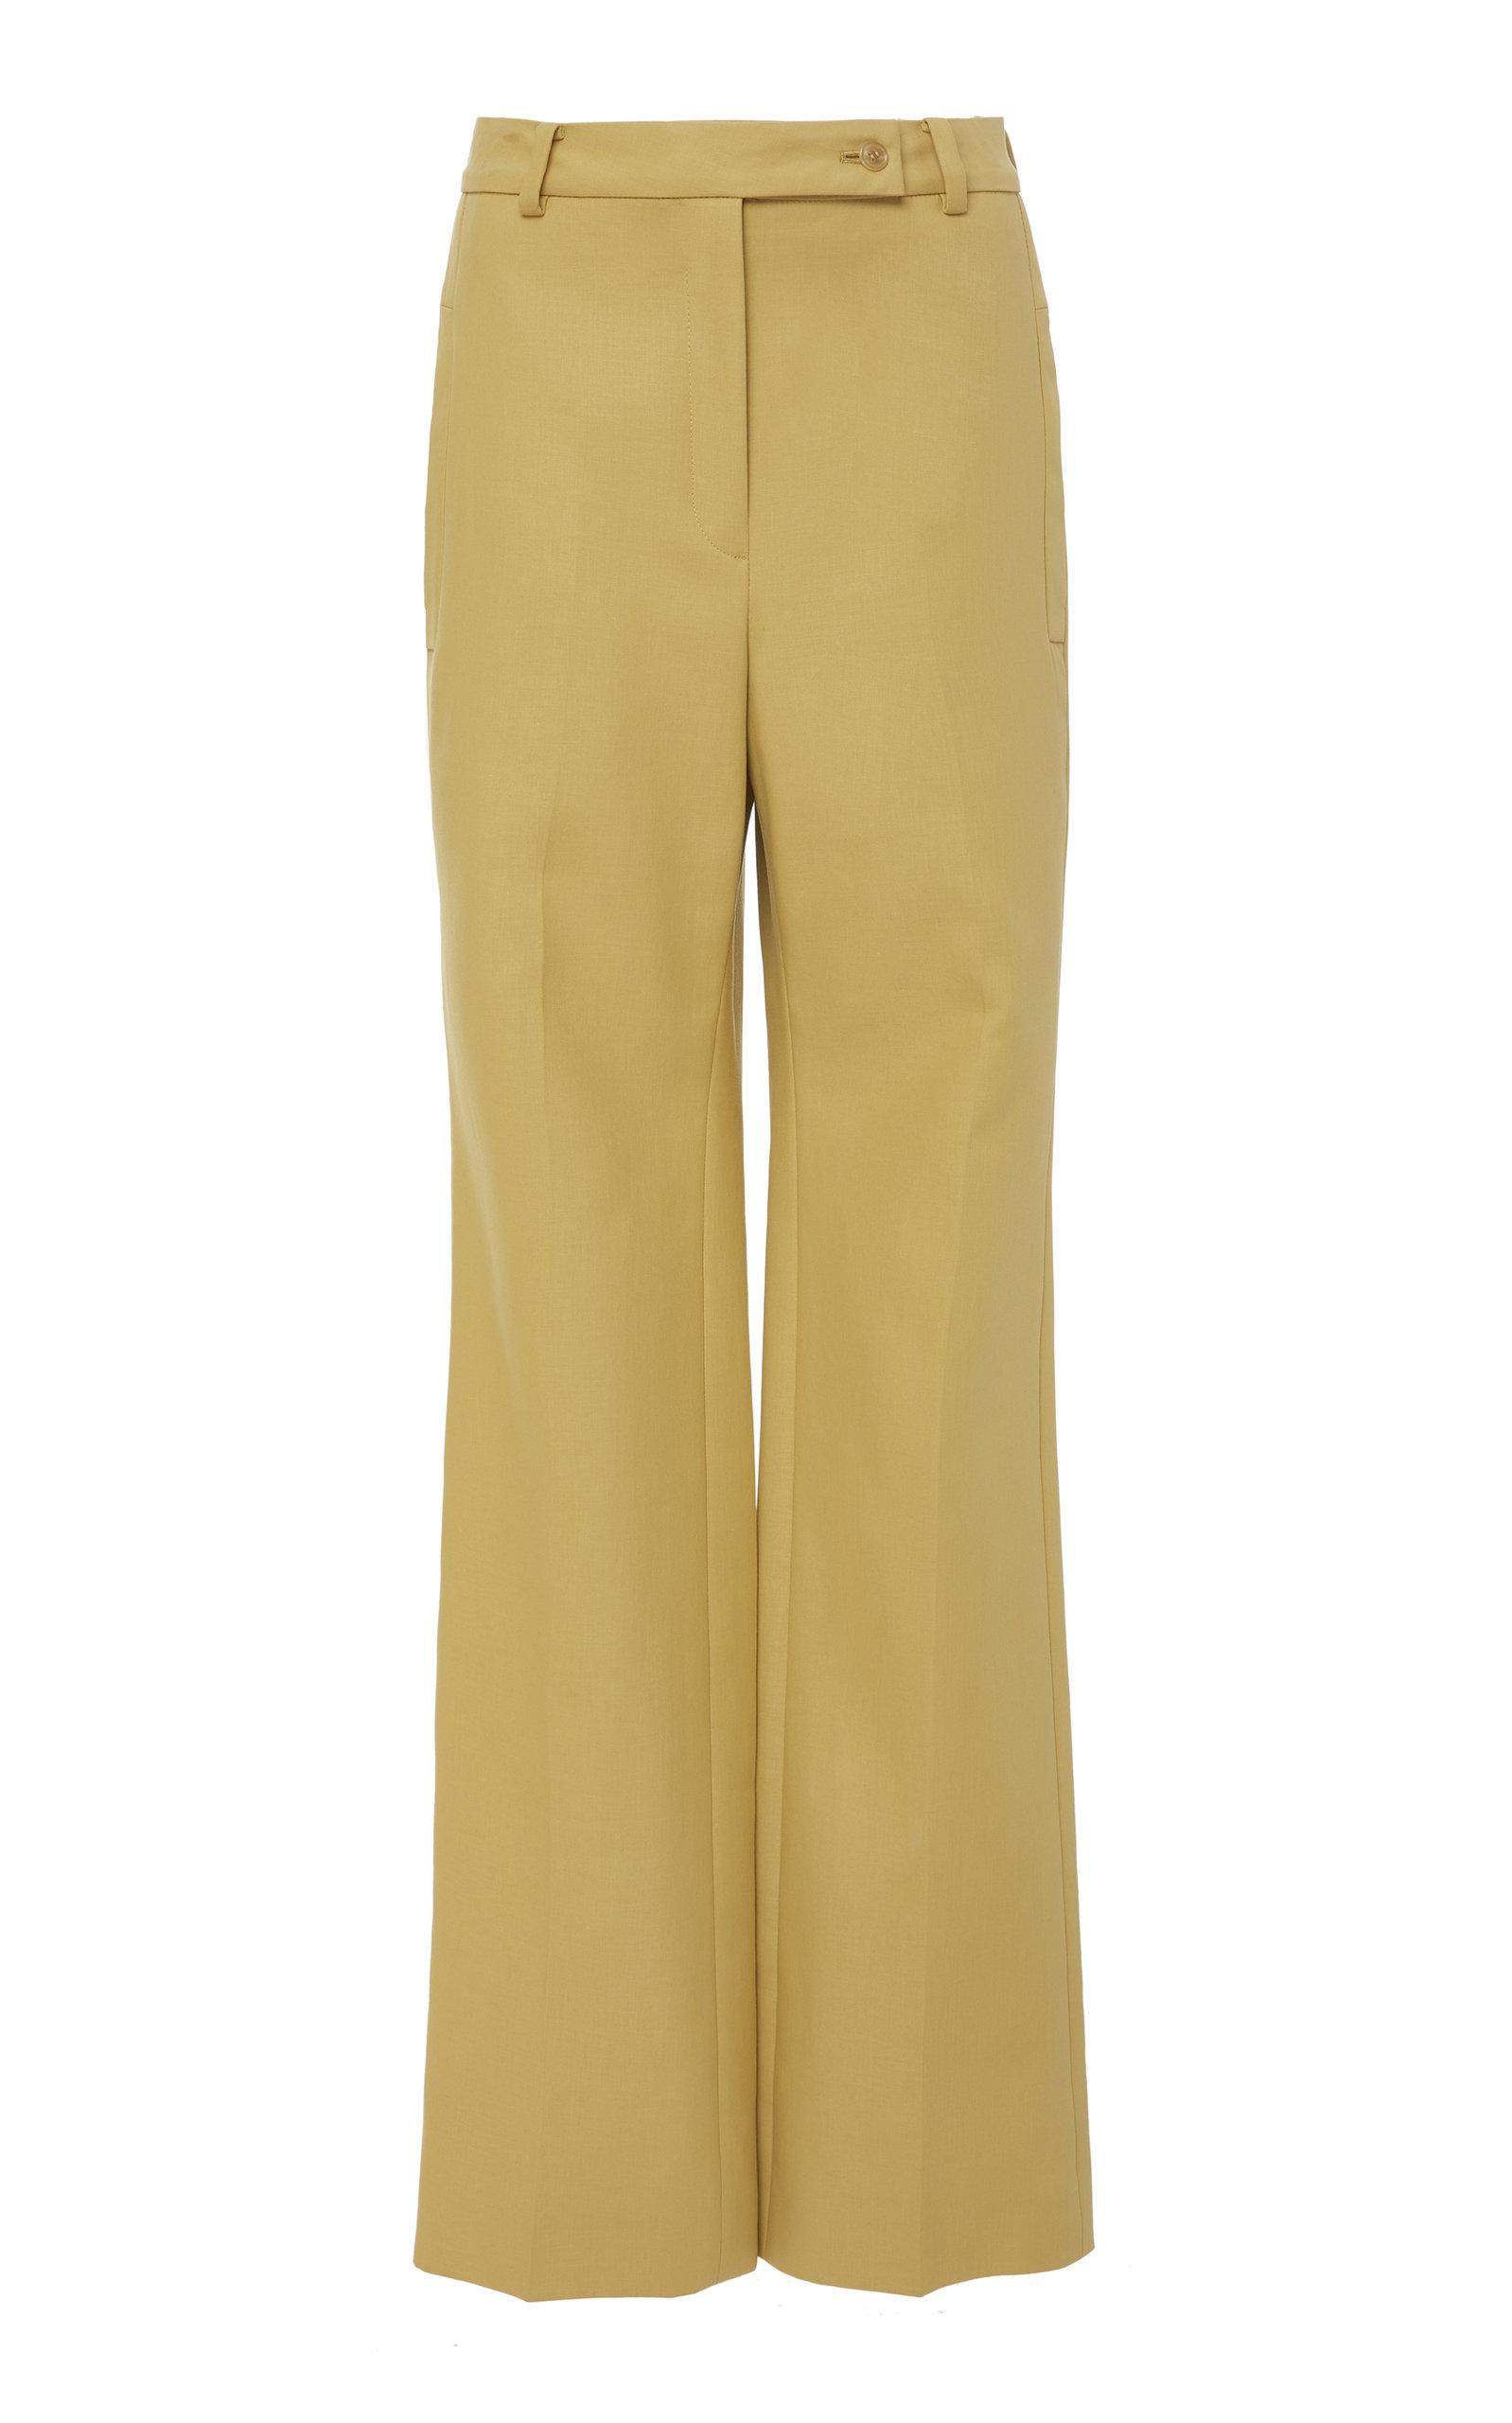 CYCLAS COTTON CLOTH SEMI FLARE PANTS